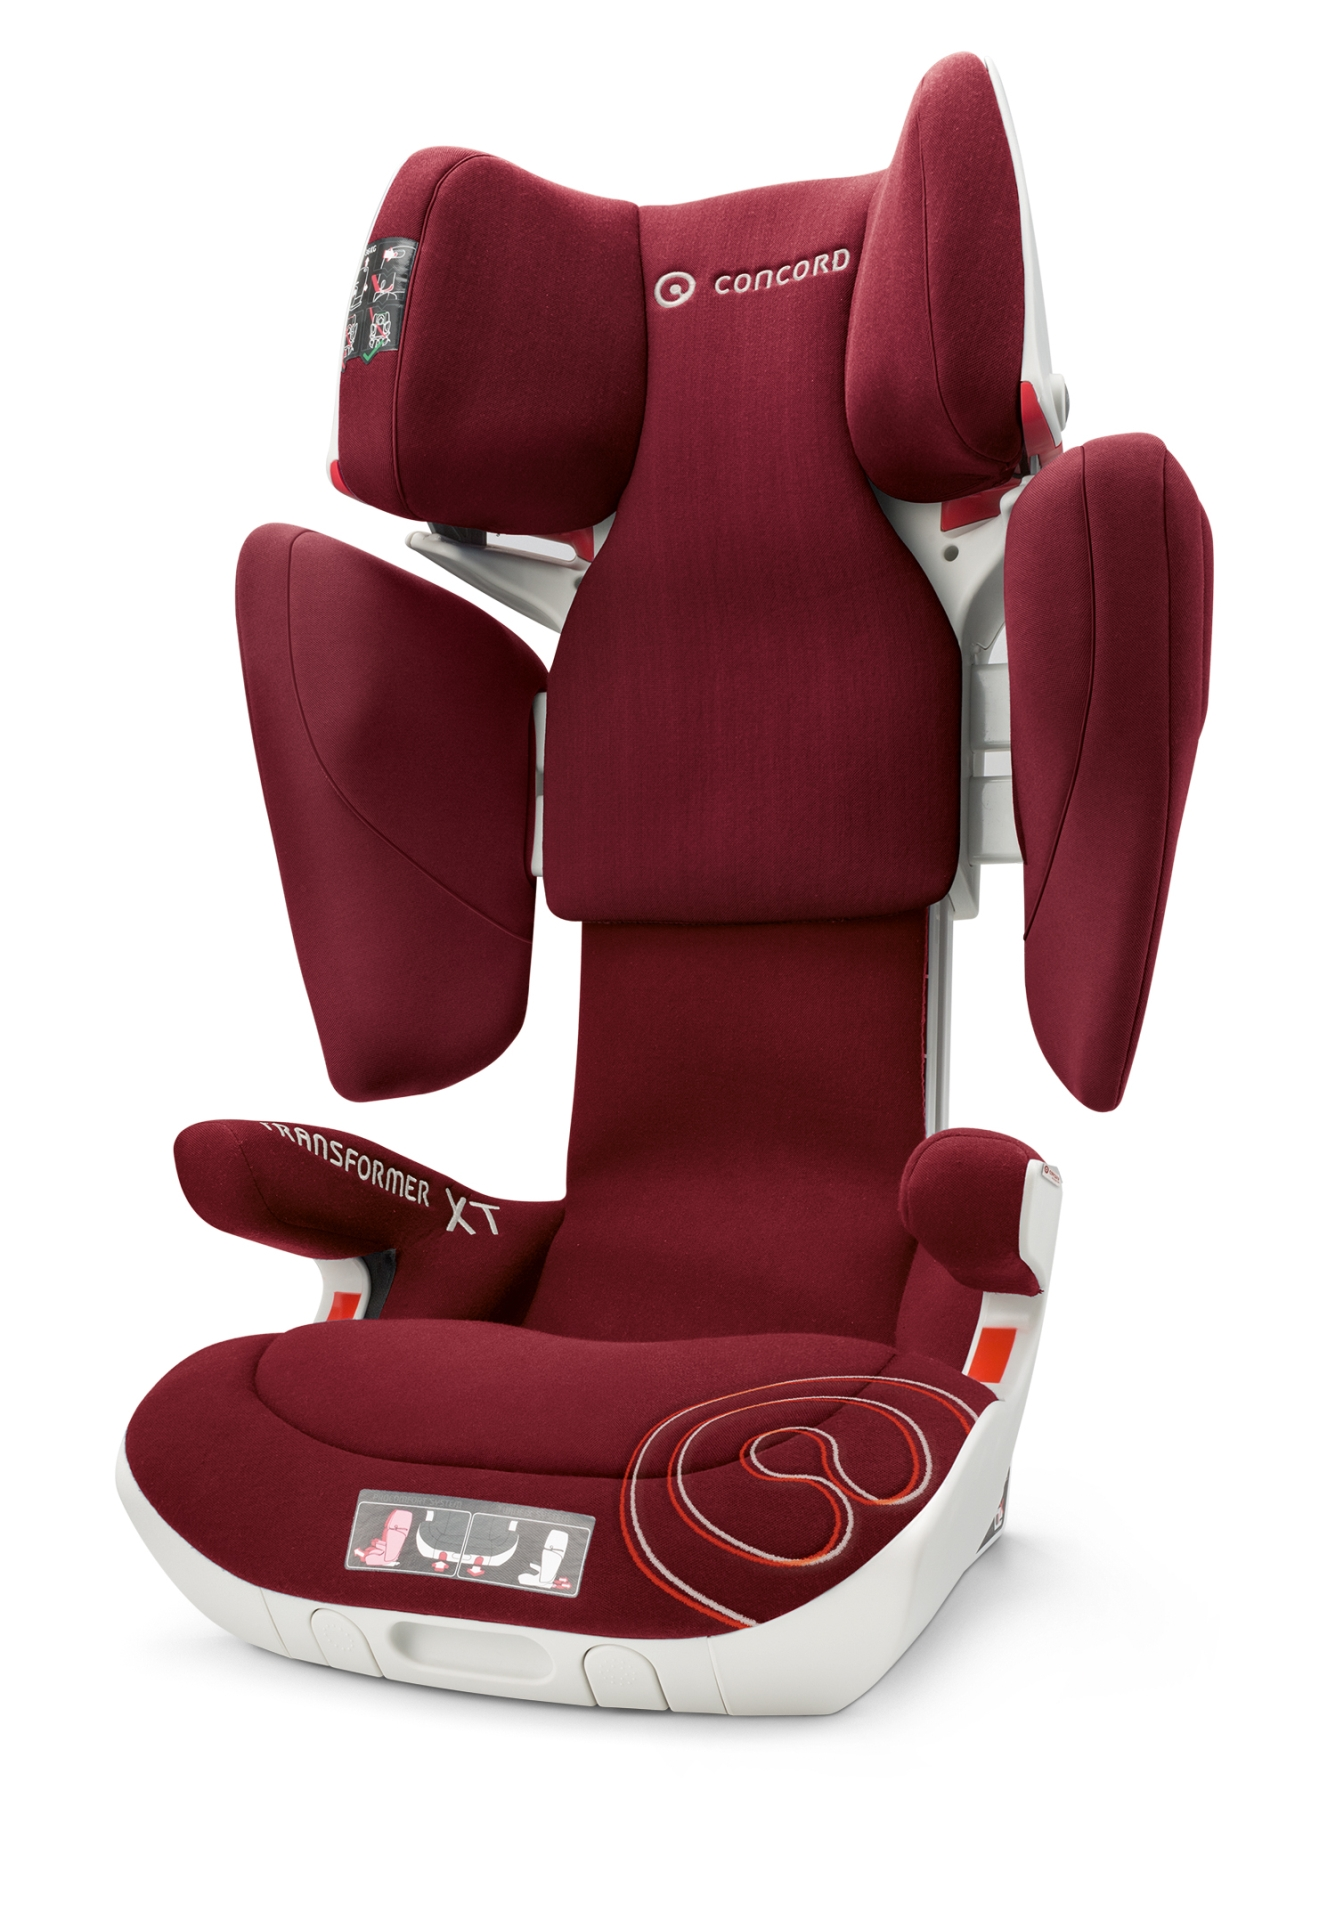 concord child car seat transformer xt 2018 bordeaux red buy at kidsroom car seats isofix. Black Bedroom Furniture Sets. Home Design Ideas